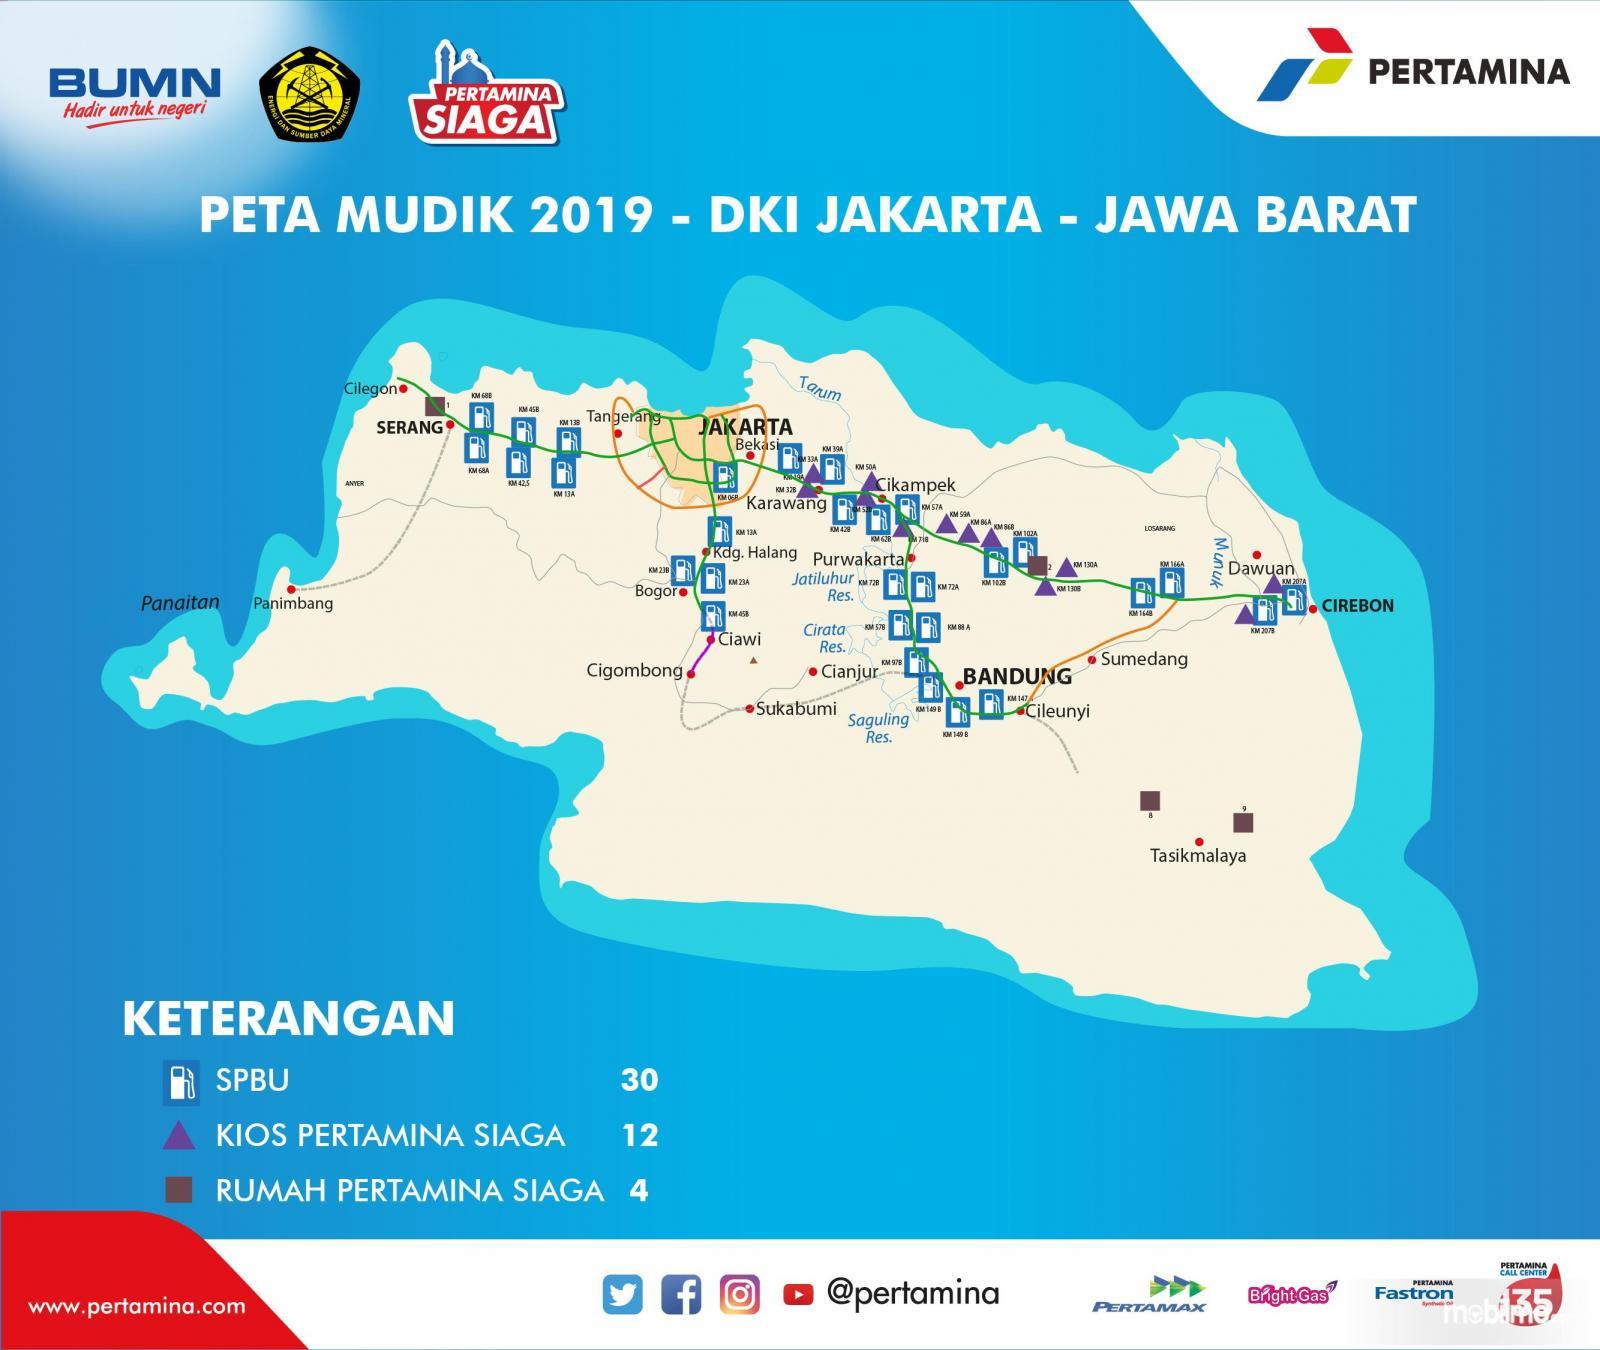 Peta Pertamina Siaga wilayah Provinsi Jawa Barat